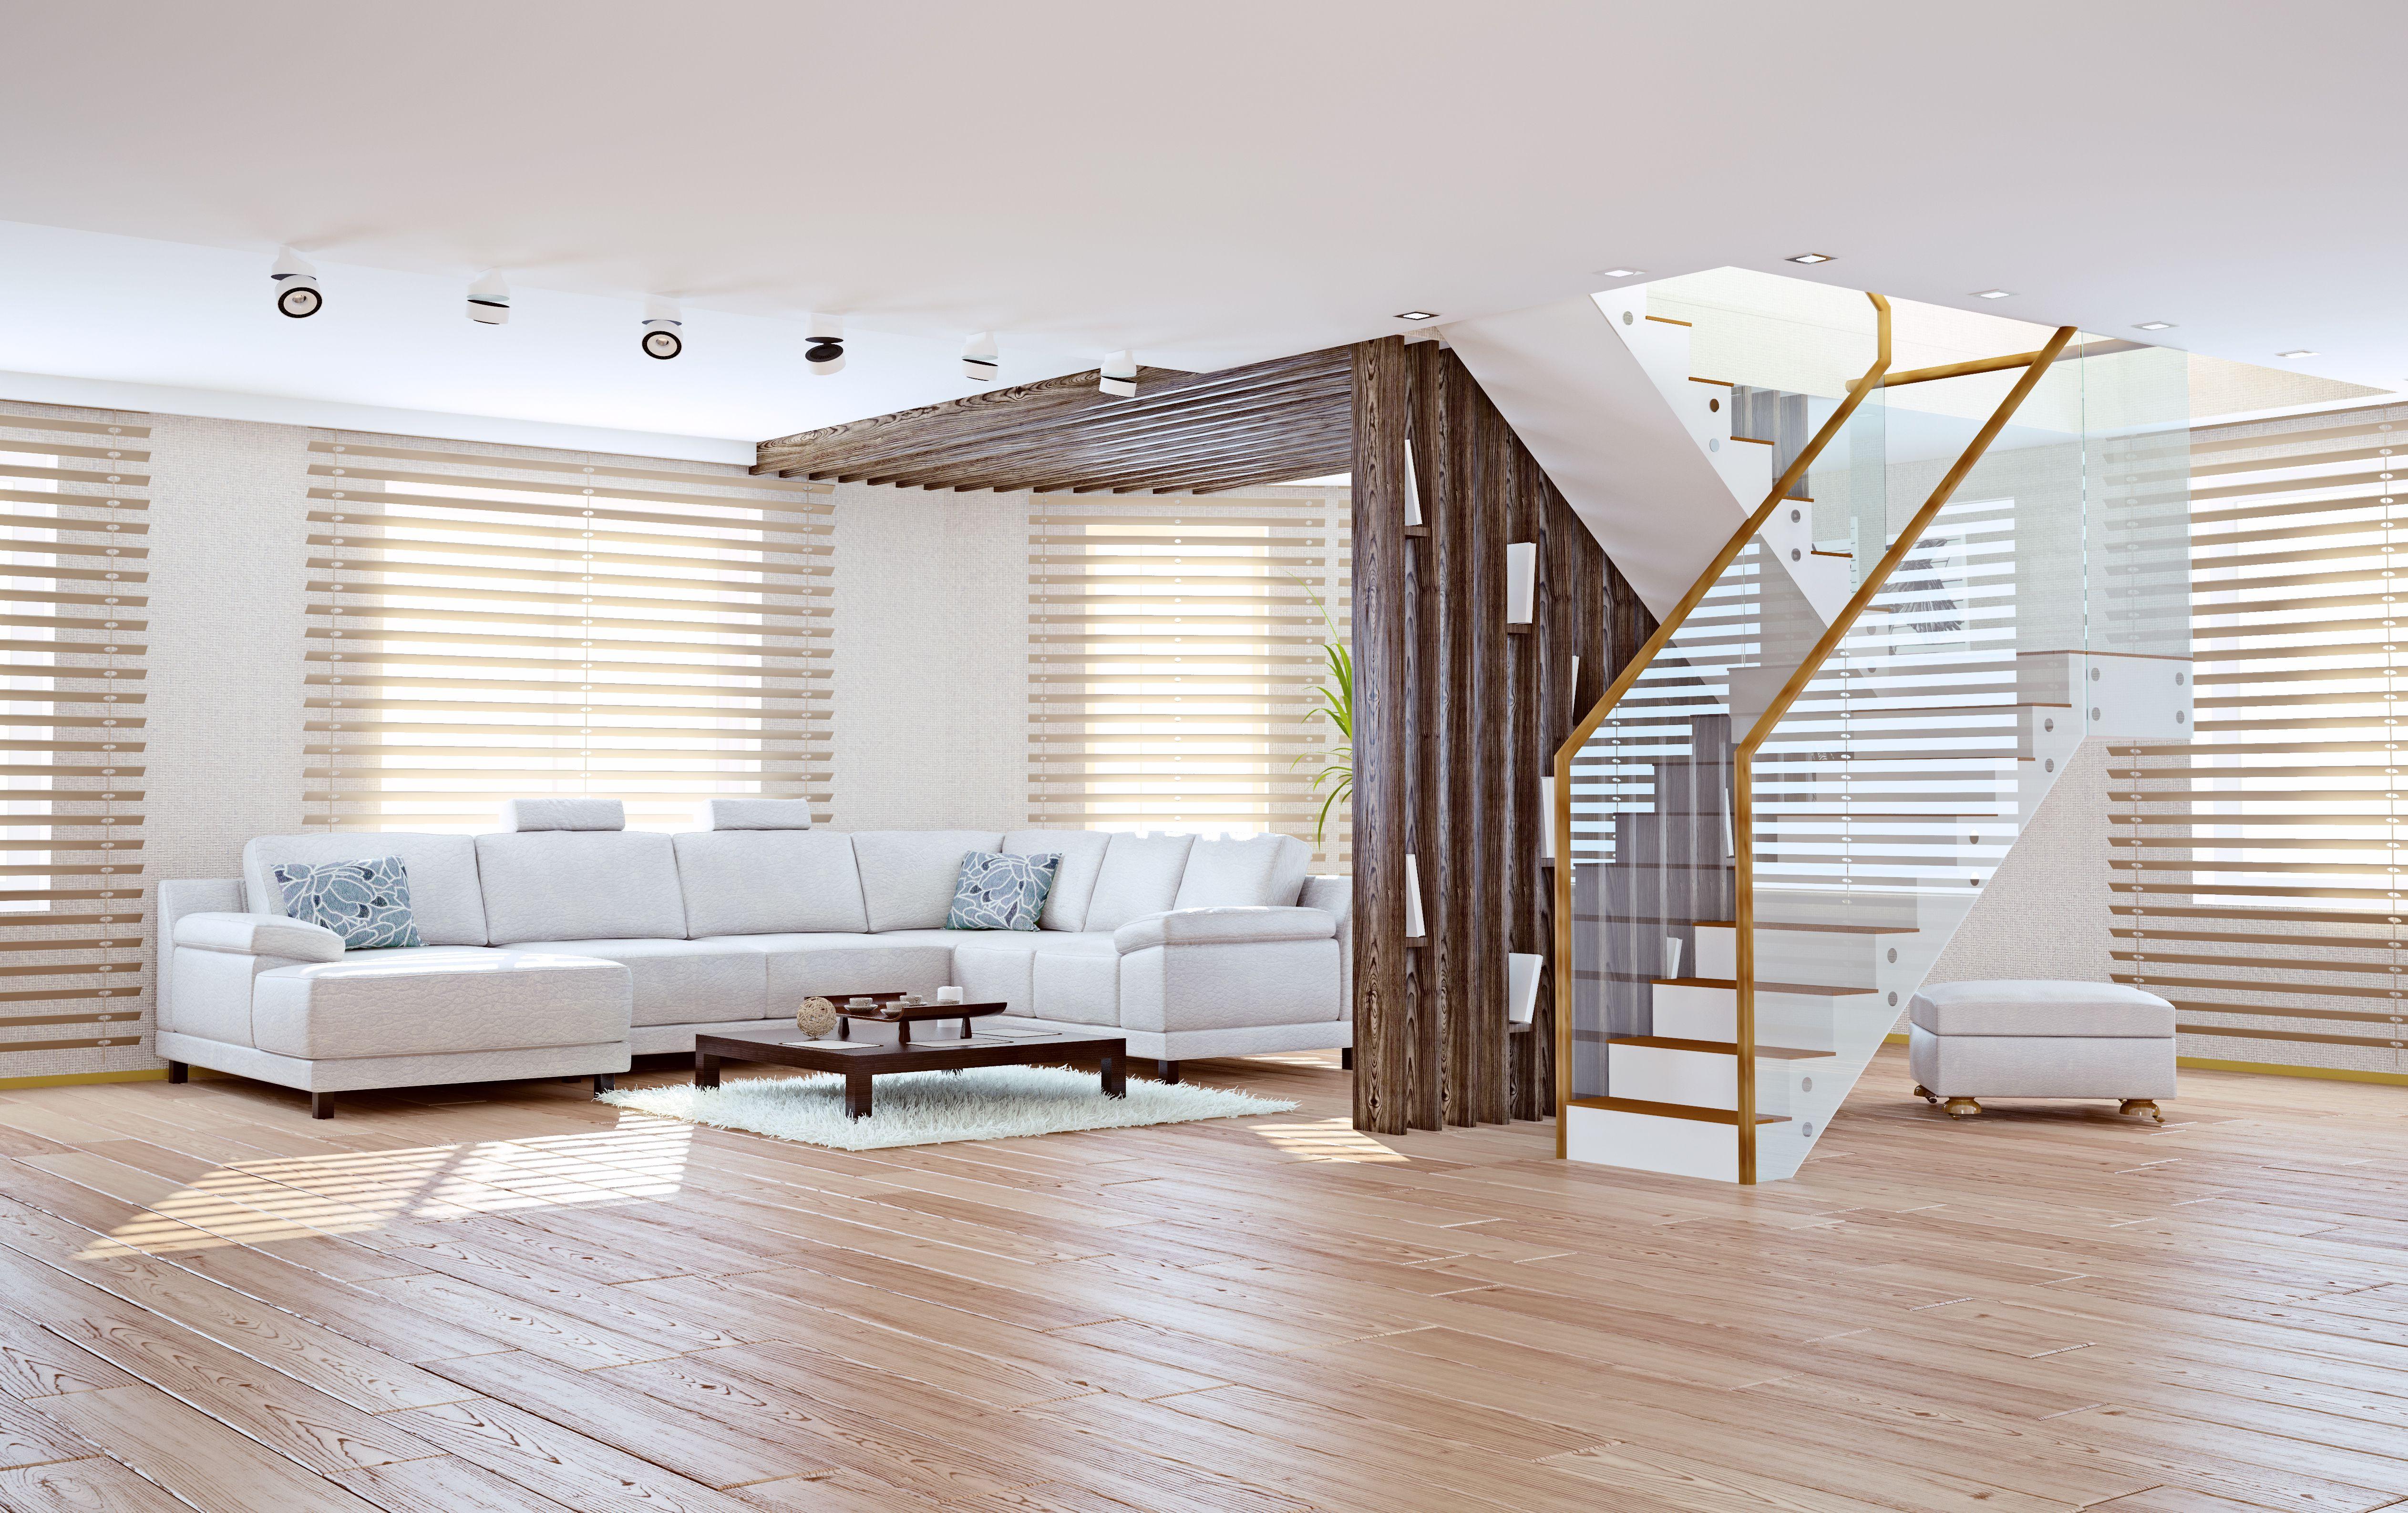 glue down hardwood floor problems of wide plank flooring myths and advice regarding basics of true wide plank flooring